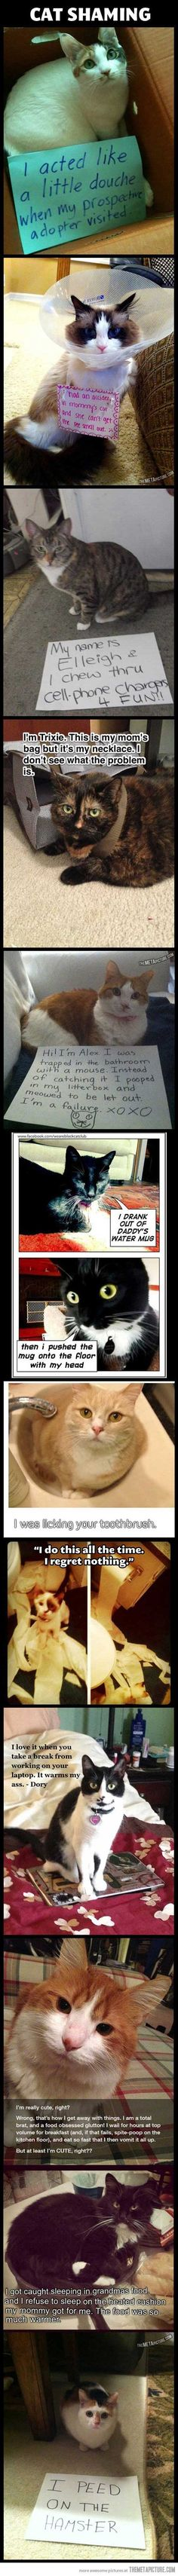 cat shaming   Mommy Has A Potty MouthMommy Has A Potty Mouth